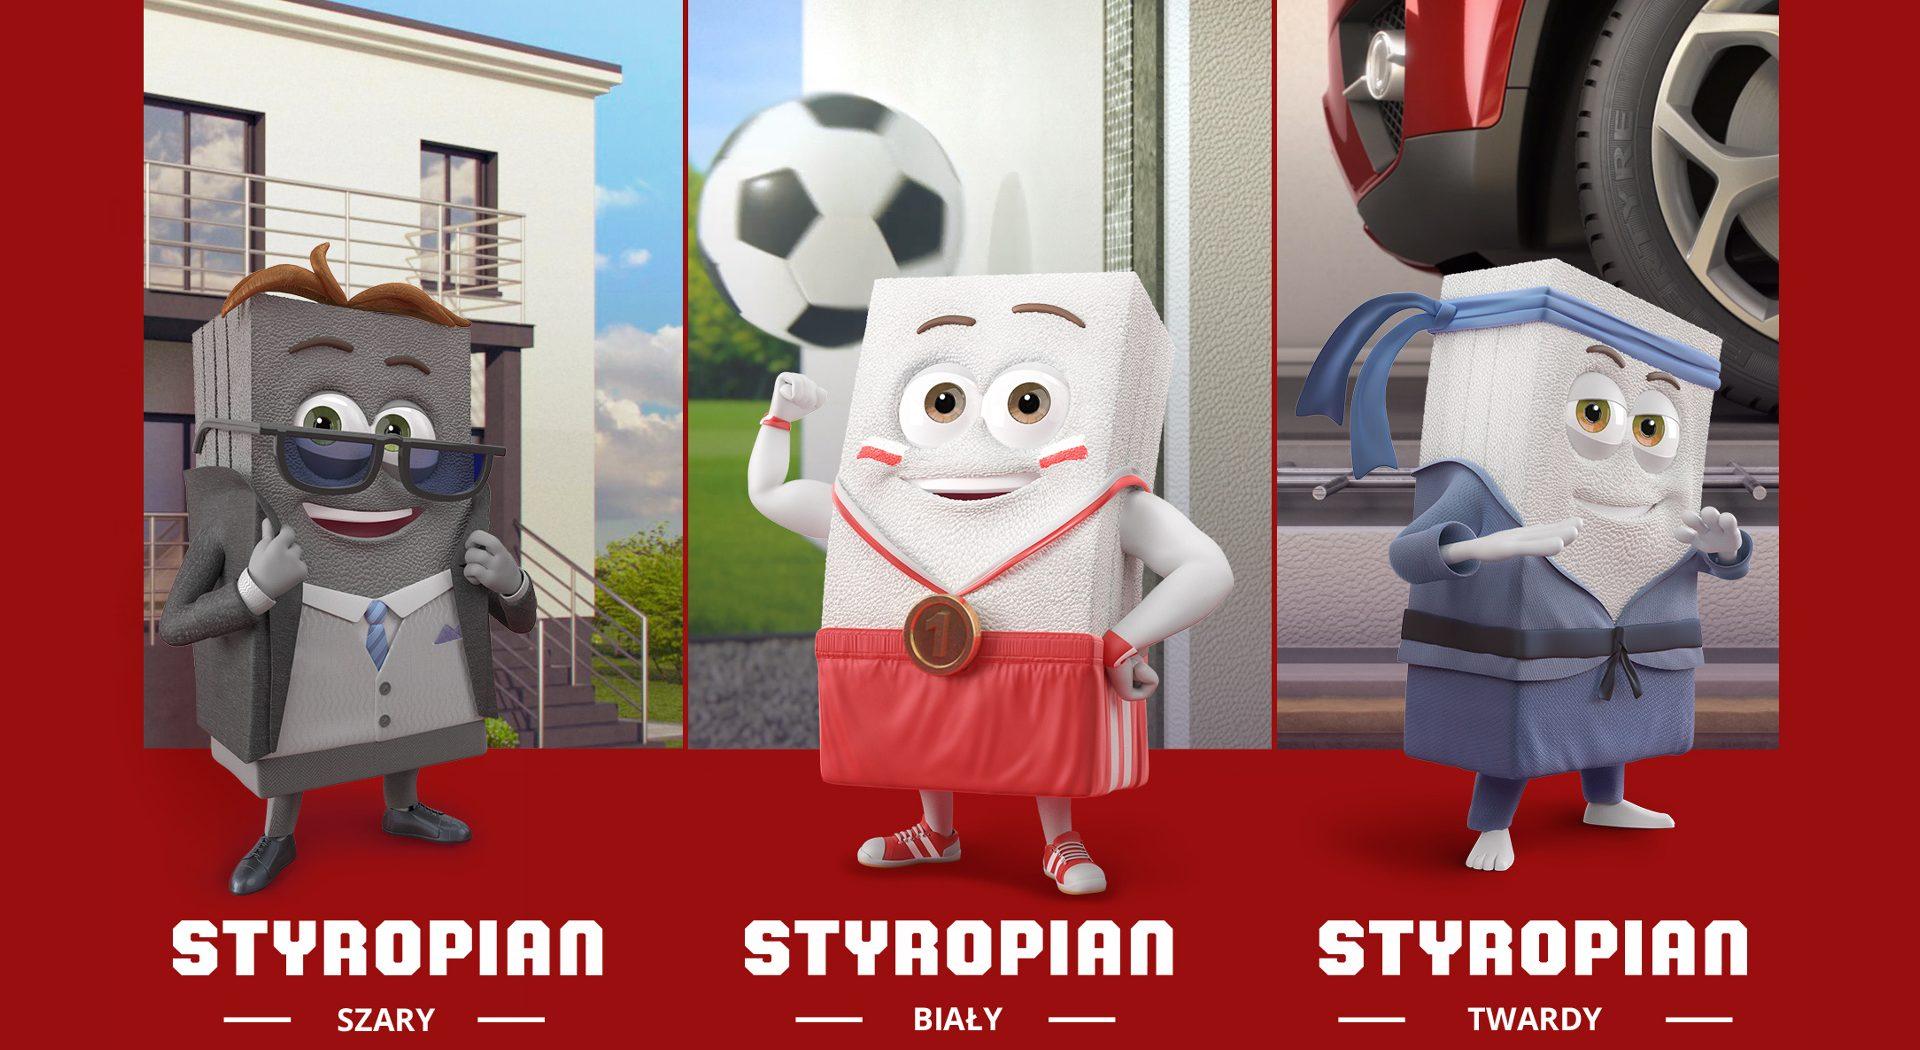 bandera_for_PSPS_styropian_bialy_styropian_twardy_styropian_szary_termoizolacja